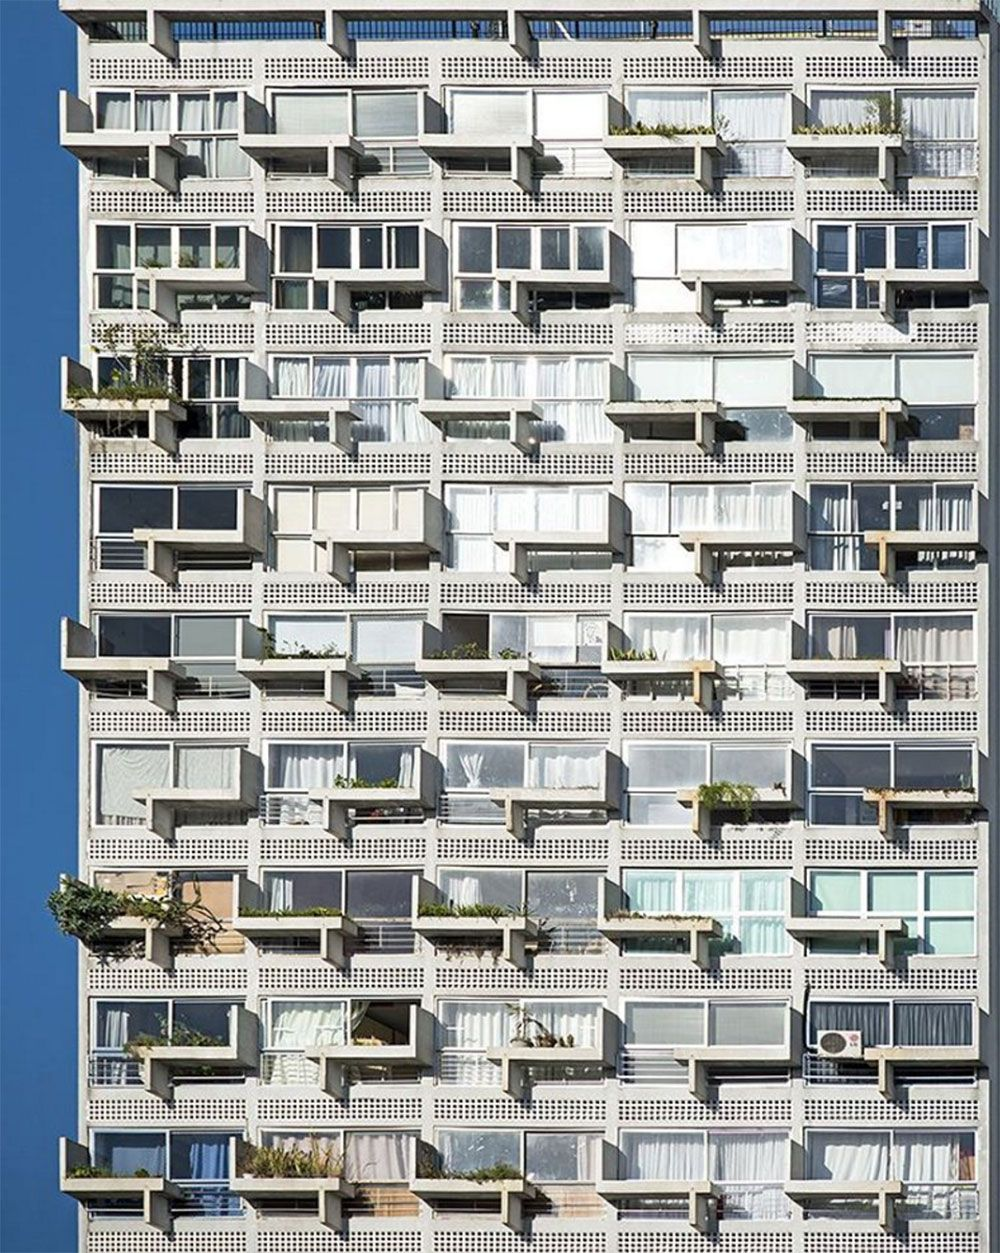 Carl Pop fotografia arquitetura